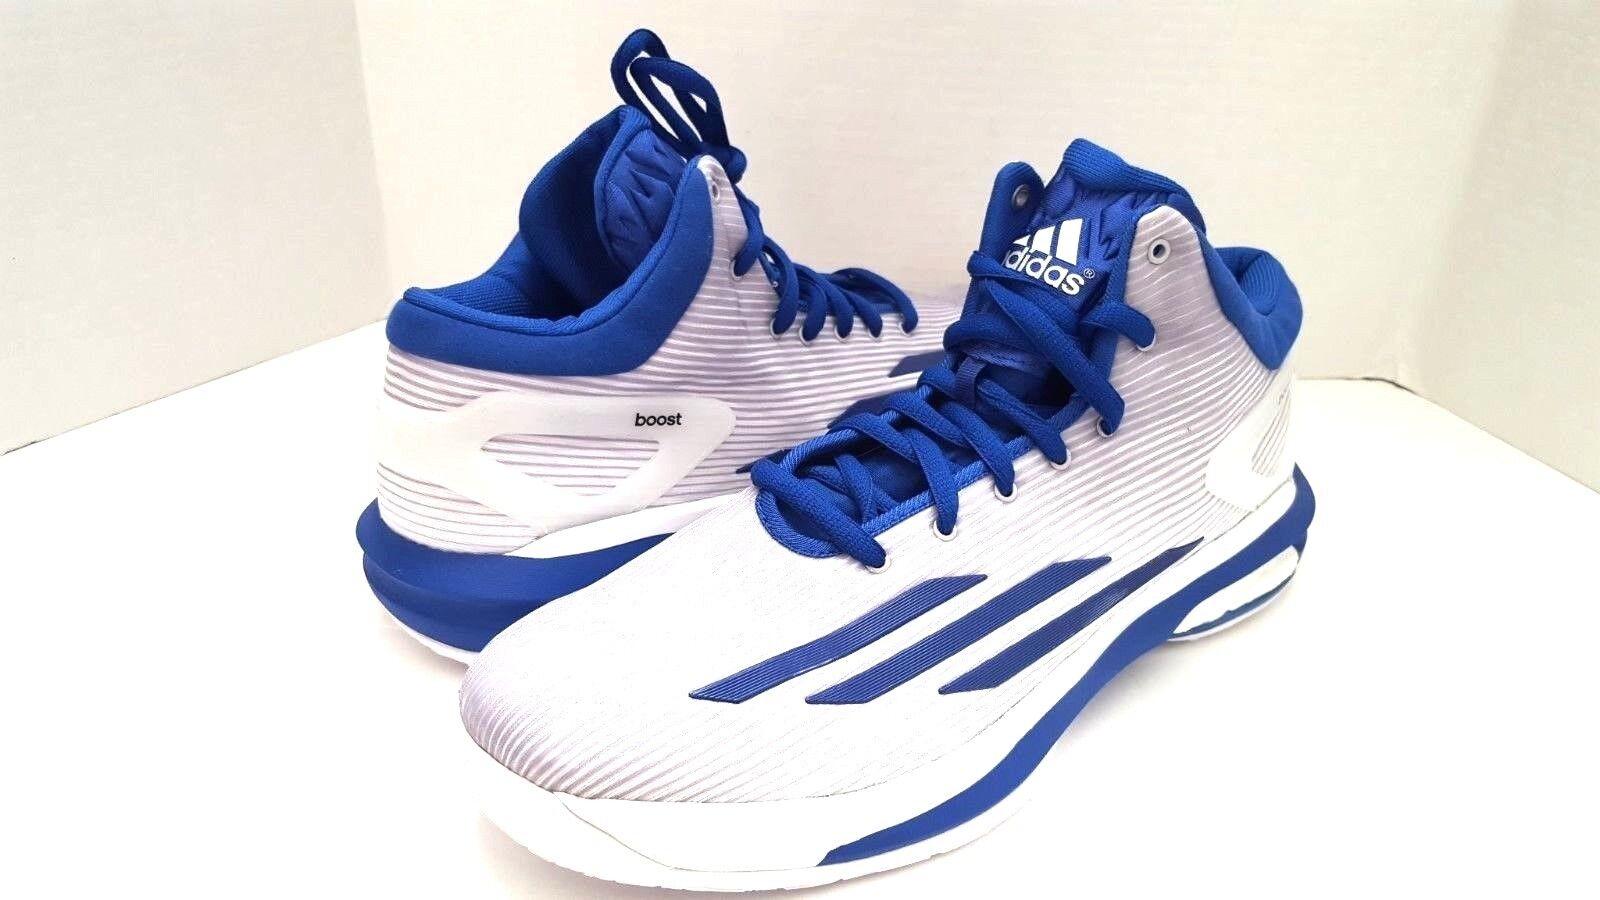 Nuevo Adidas Crazylight Boost S84606 Zapatos de hombre baloncesto para hombre de US,47.1/3 FR f3e7d7